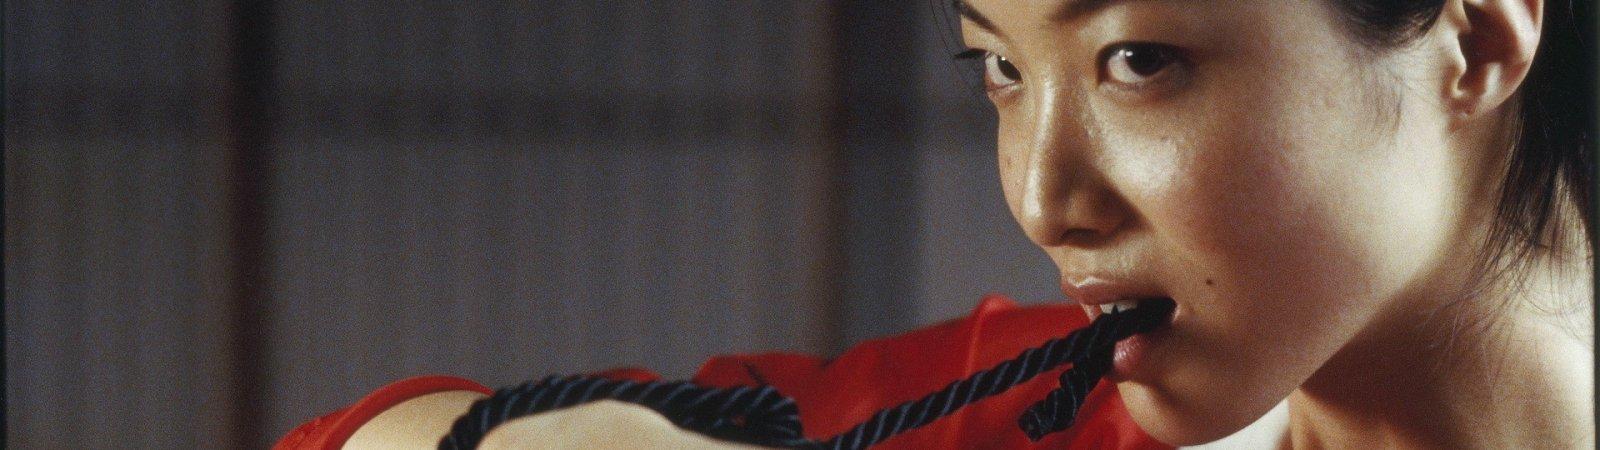 Photo dernier film Ryo Ishibashi